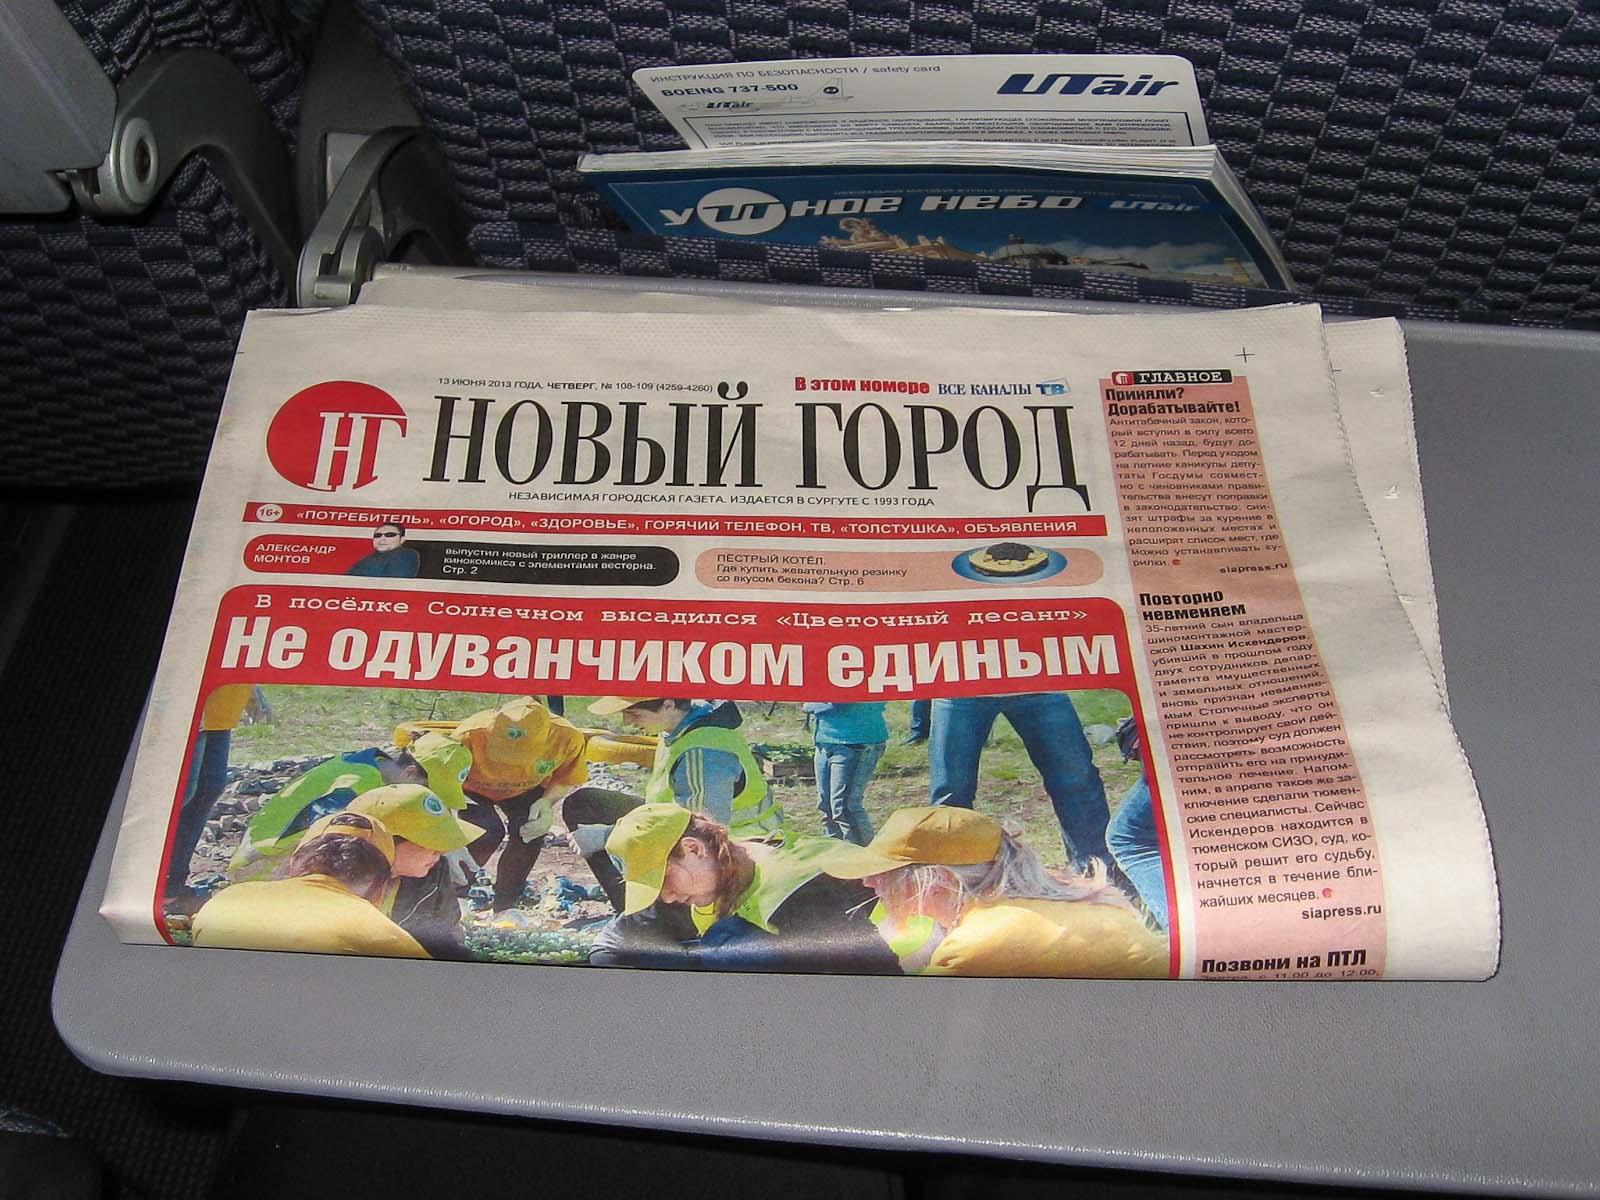 Сургутская газета